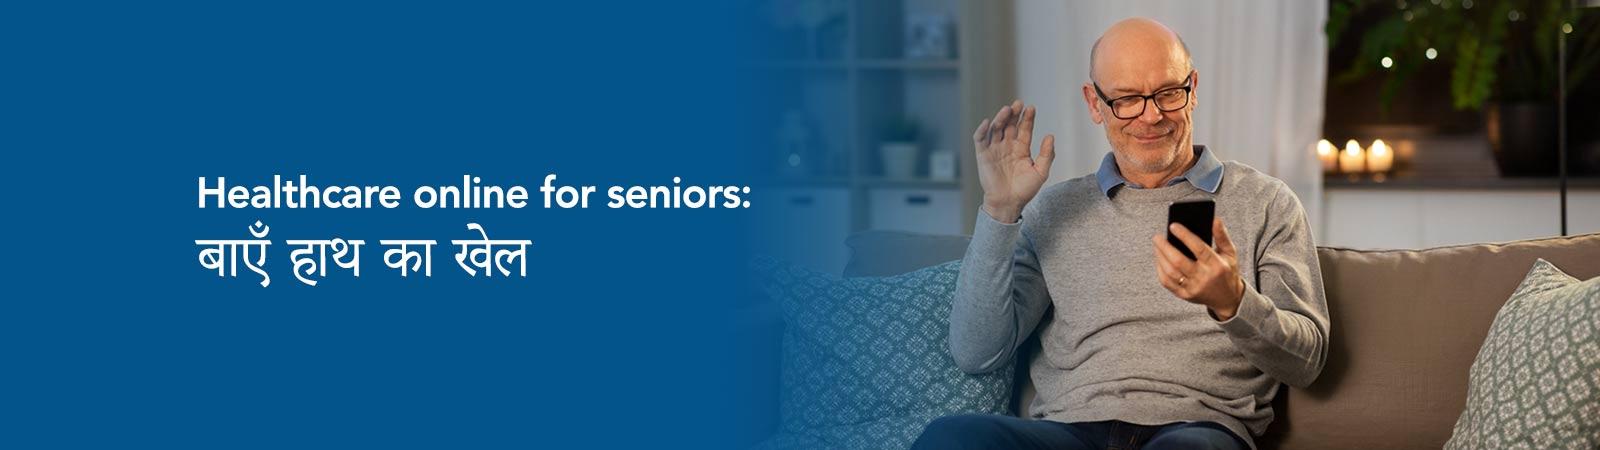 Healthcare online for seniors: बाएँ हाथ का खेल